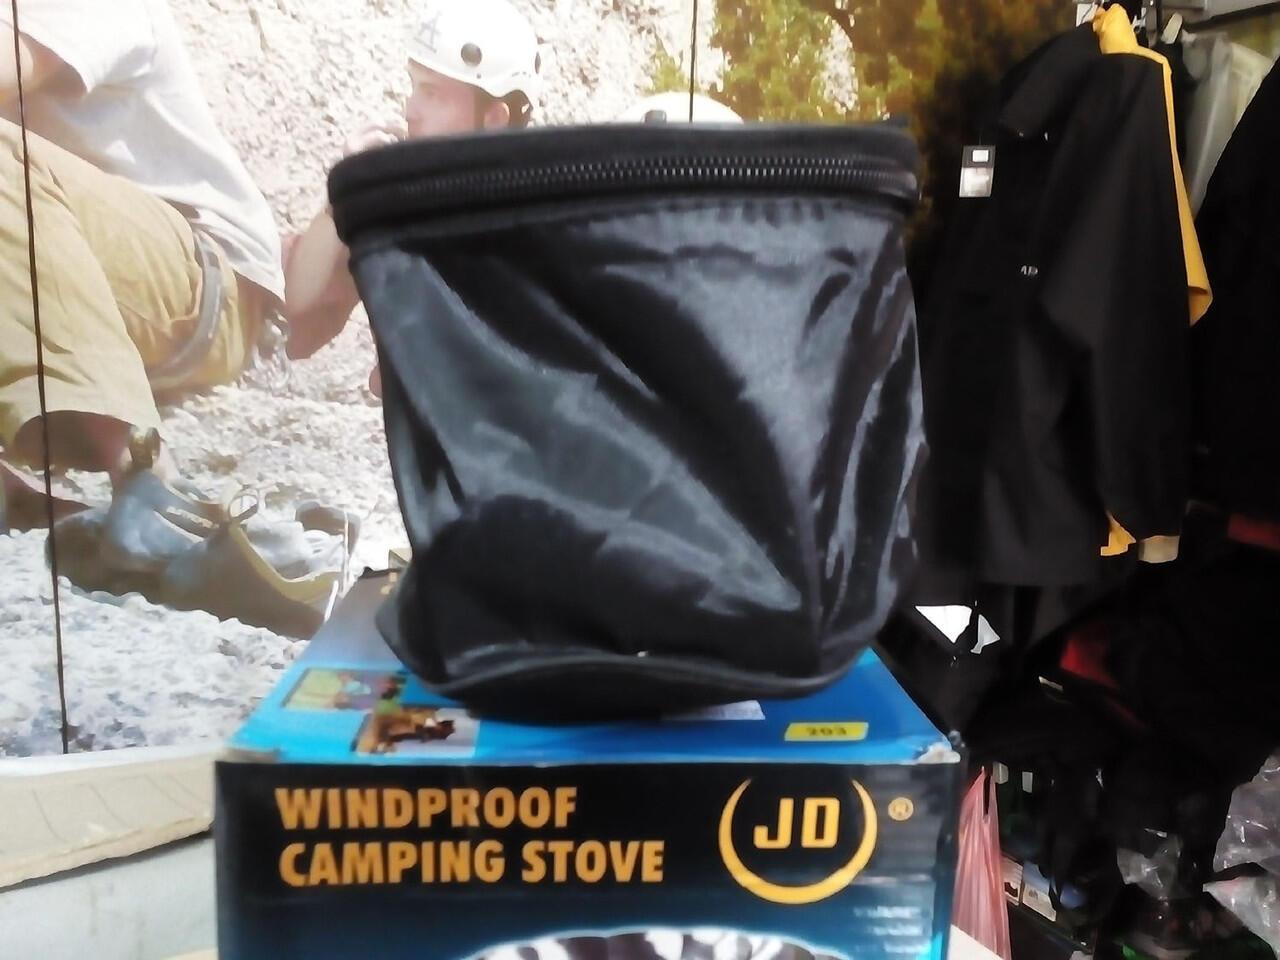 Terjual Toko Doglos Kompor Lipet Mini Windproof Outdoor Camping Stove Lapang Portable Nesting Veples Botol Tni